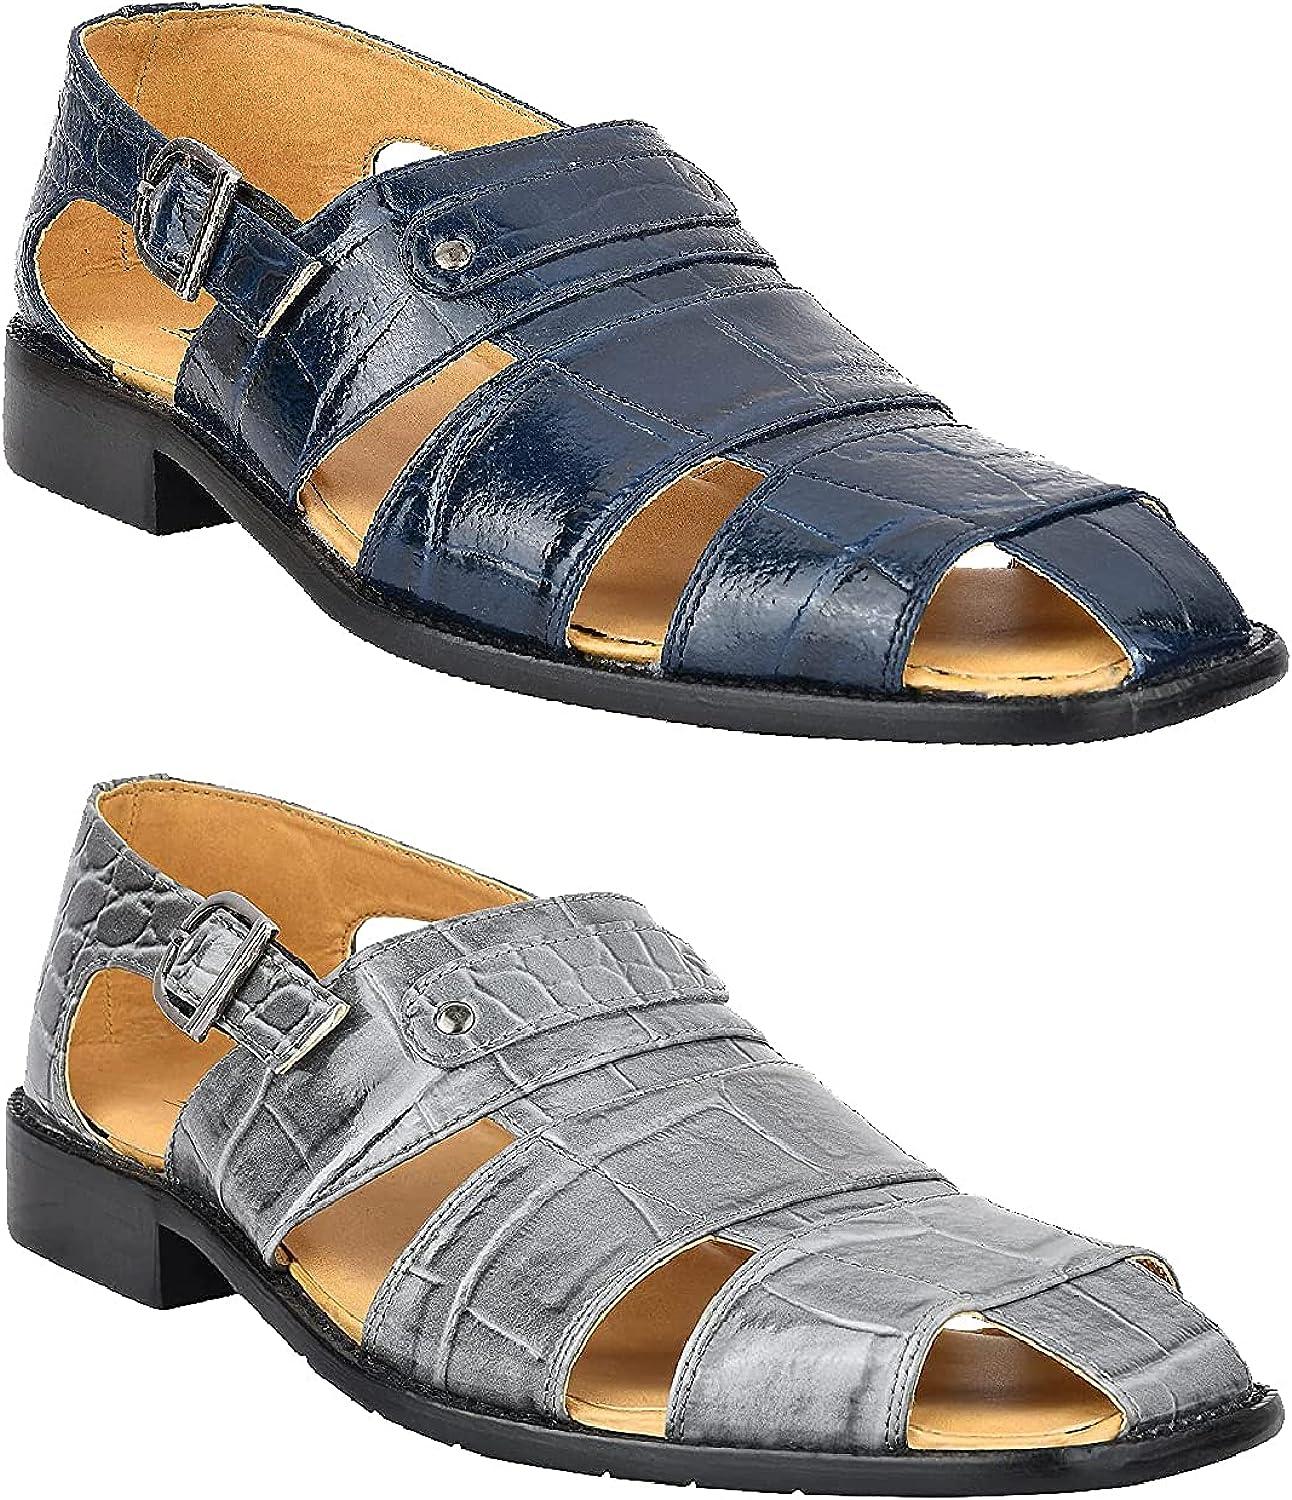 LIBERTYZENO Men's Closed Toe Selling and selling Sandals Crocodile Leather Purchase Print PU